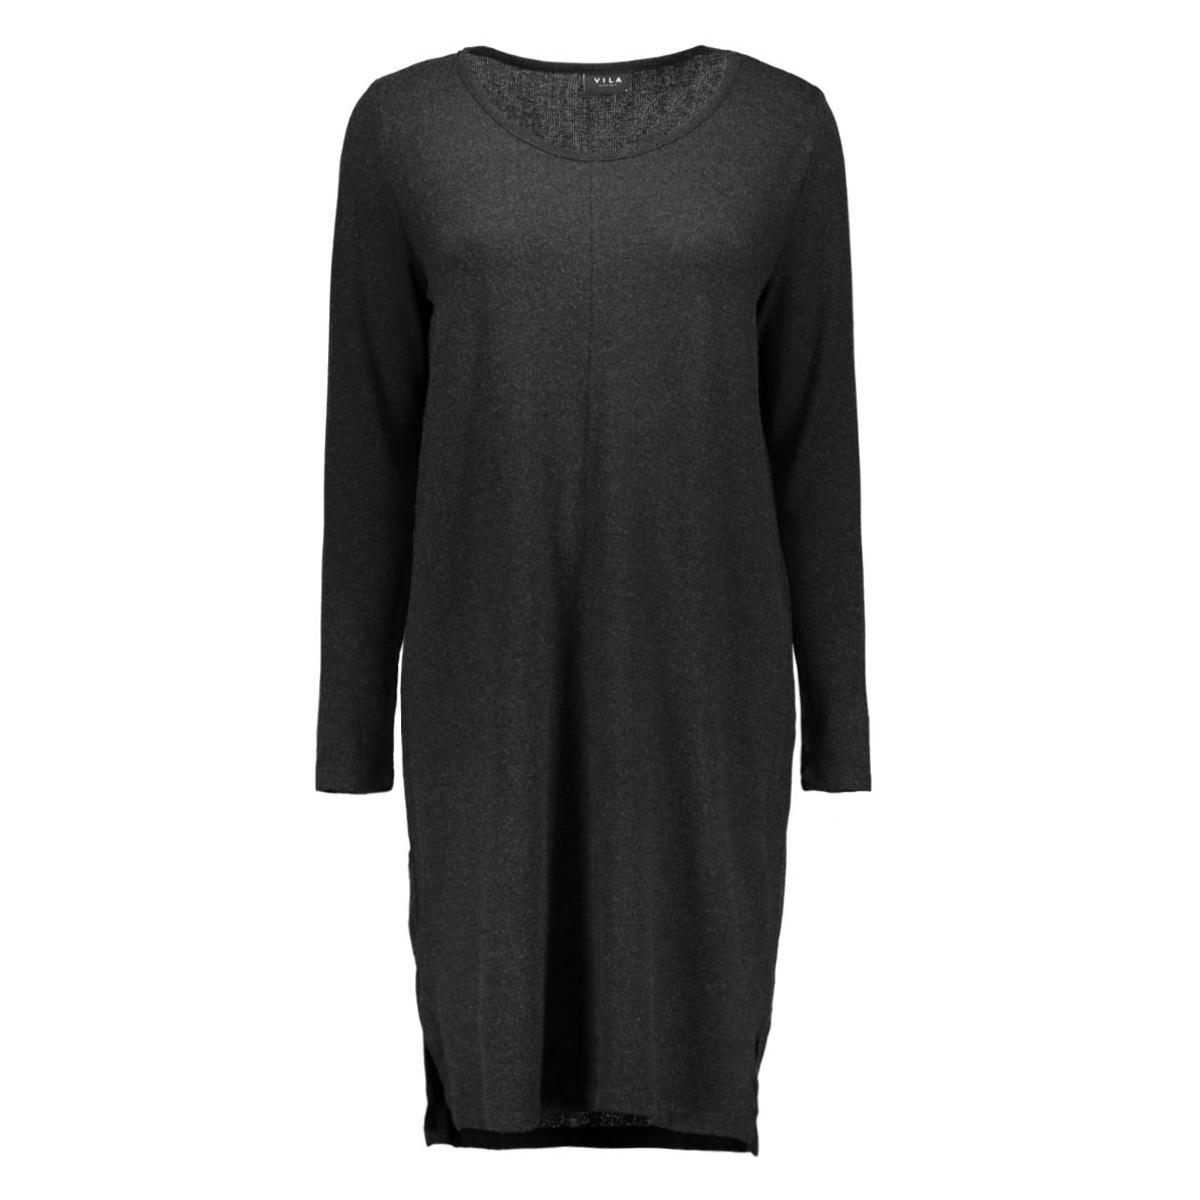 vinimas l/s dress-noos 14036230 vila jurk black/ melange